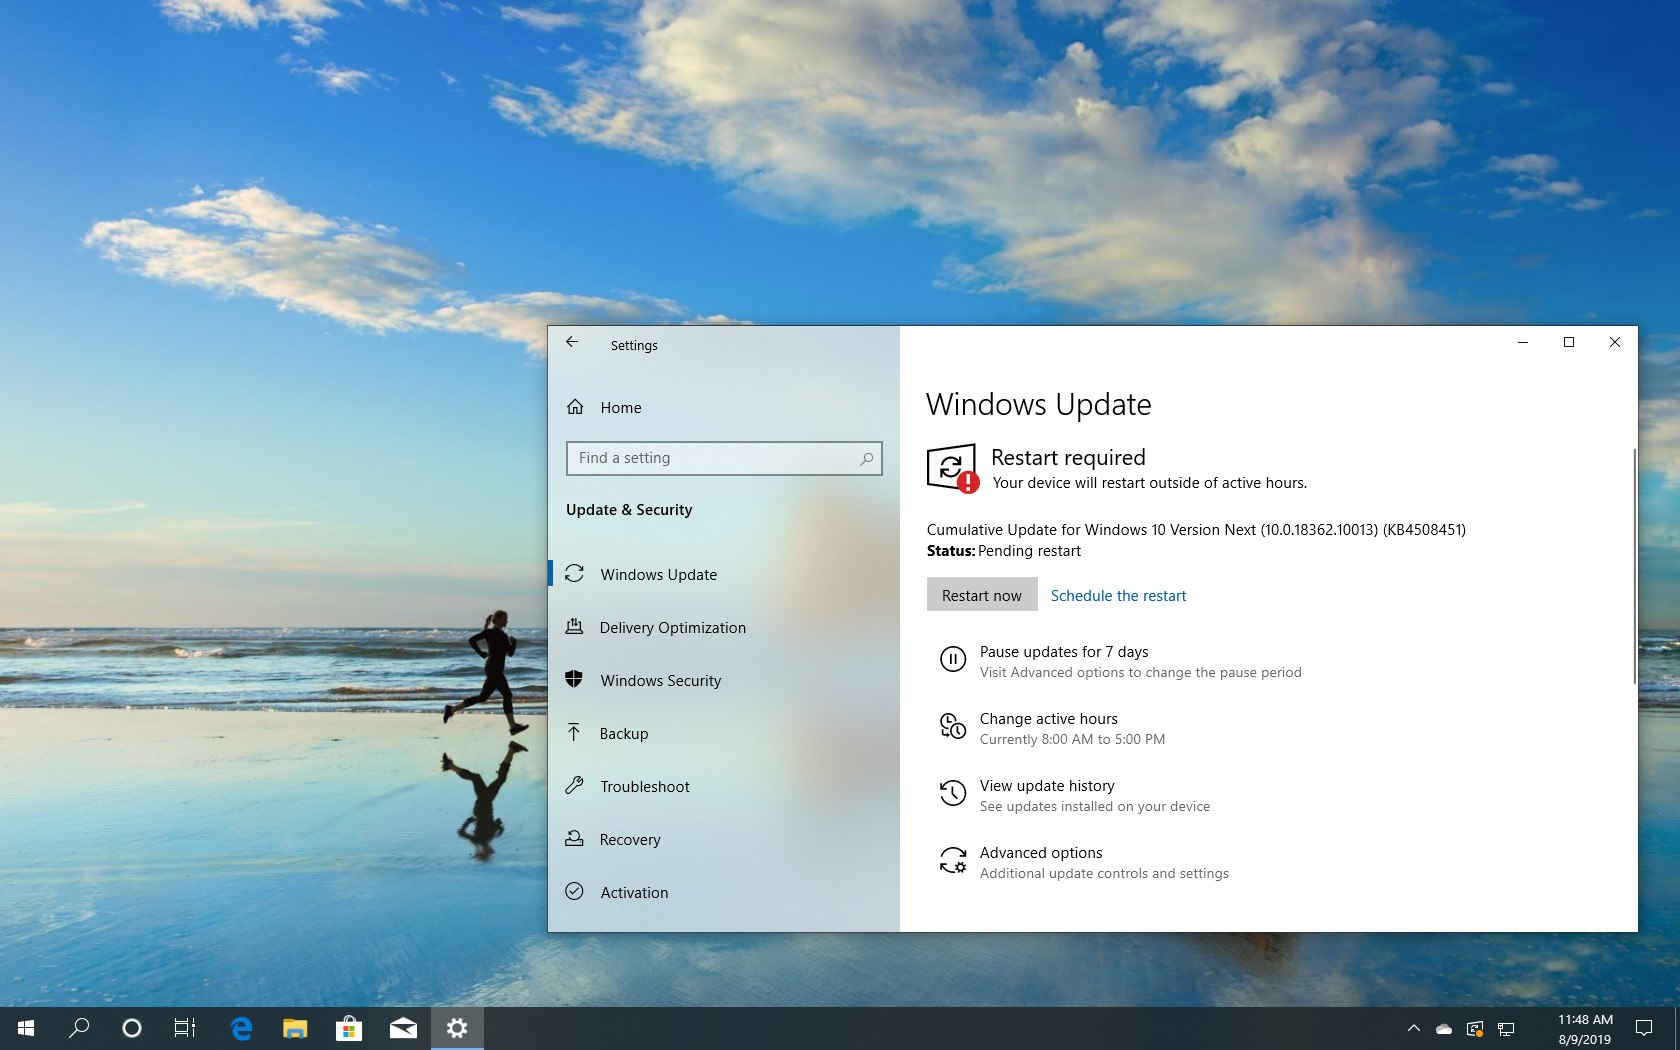 Windows 10 build 18362.10013 download